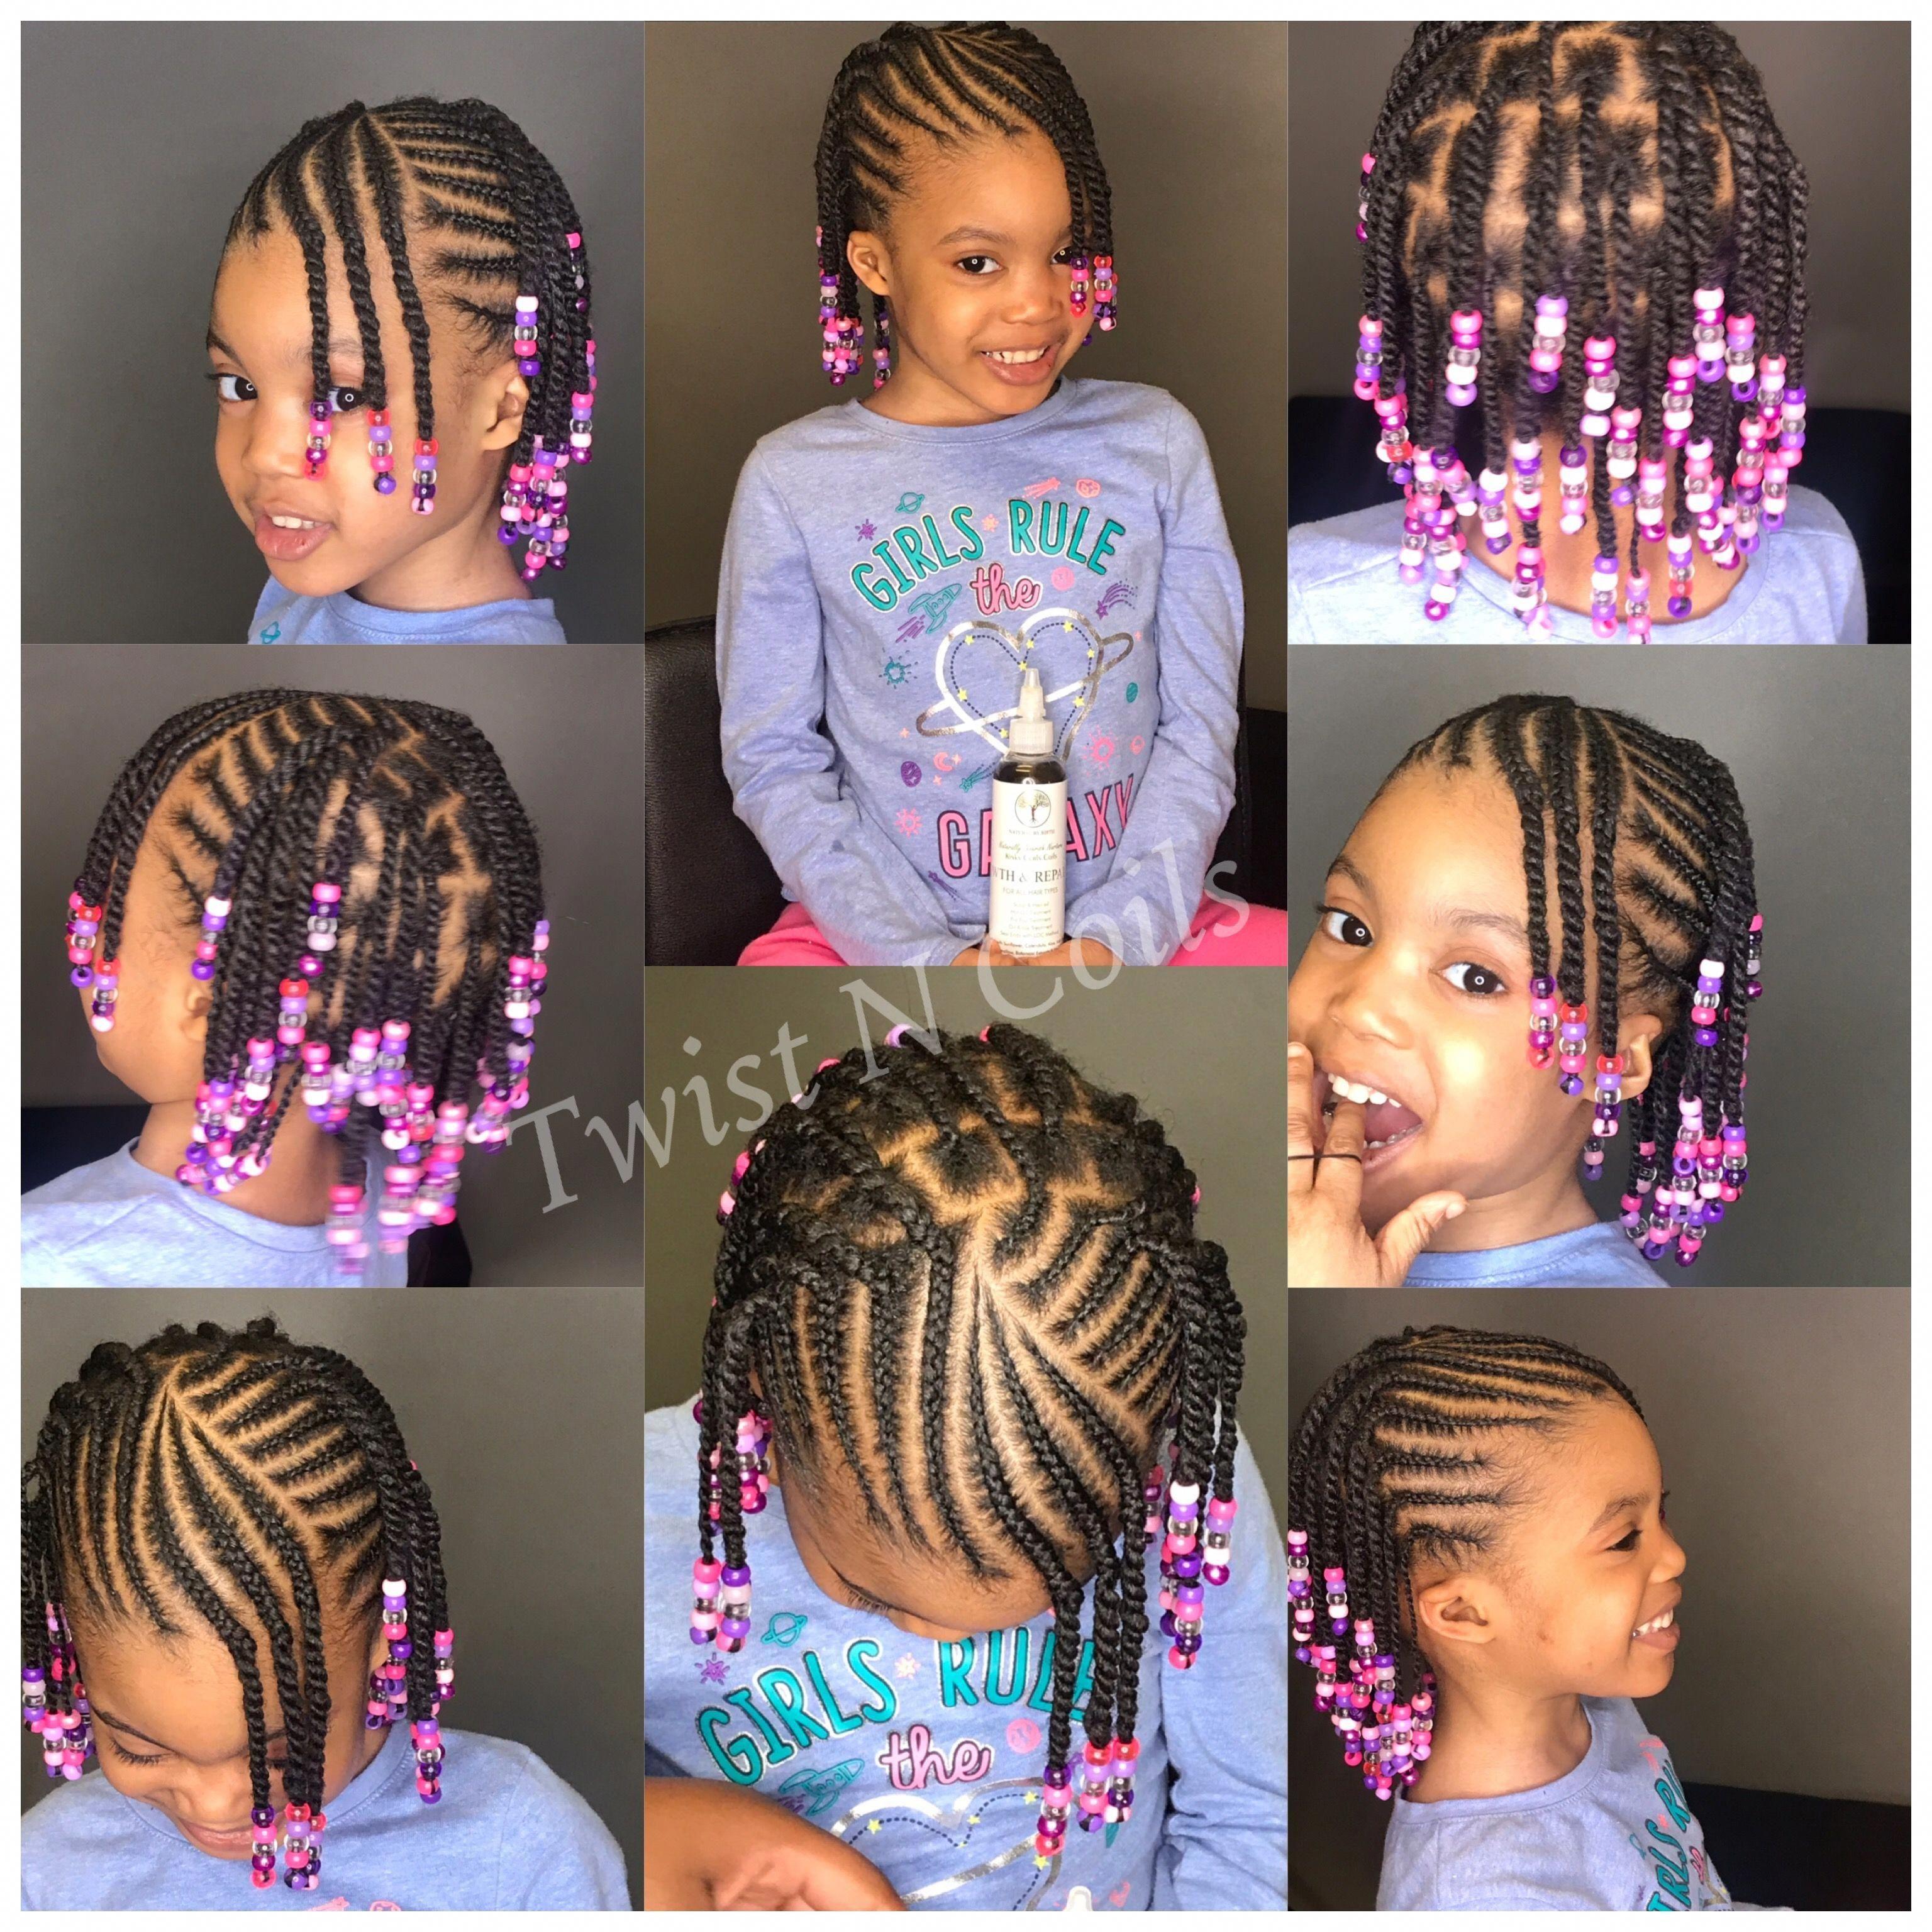 Kid Braids Braidhairstyles Braidsandbeads Blackhairstyles Kids Hairstyles Braids For Kids Kids Hairstyles Girls